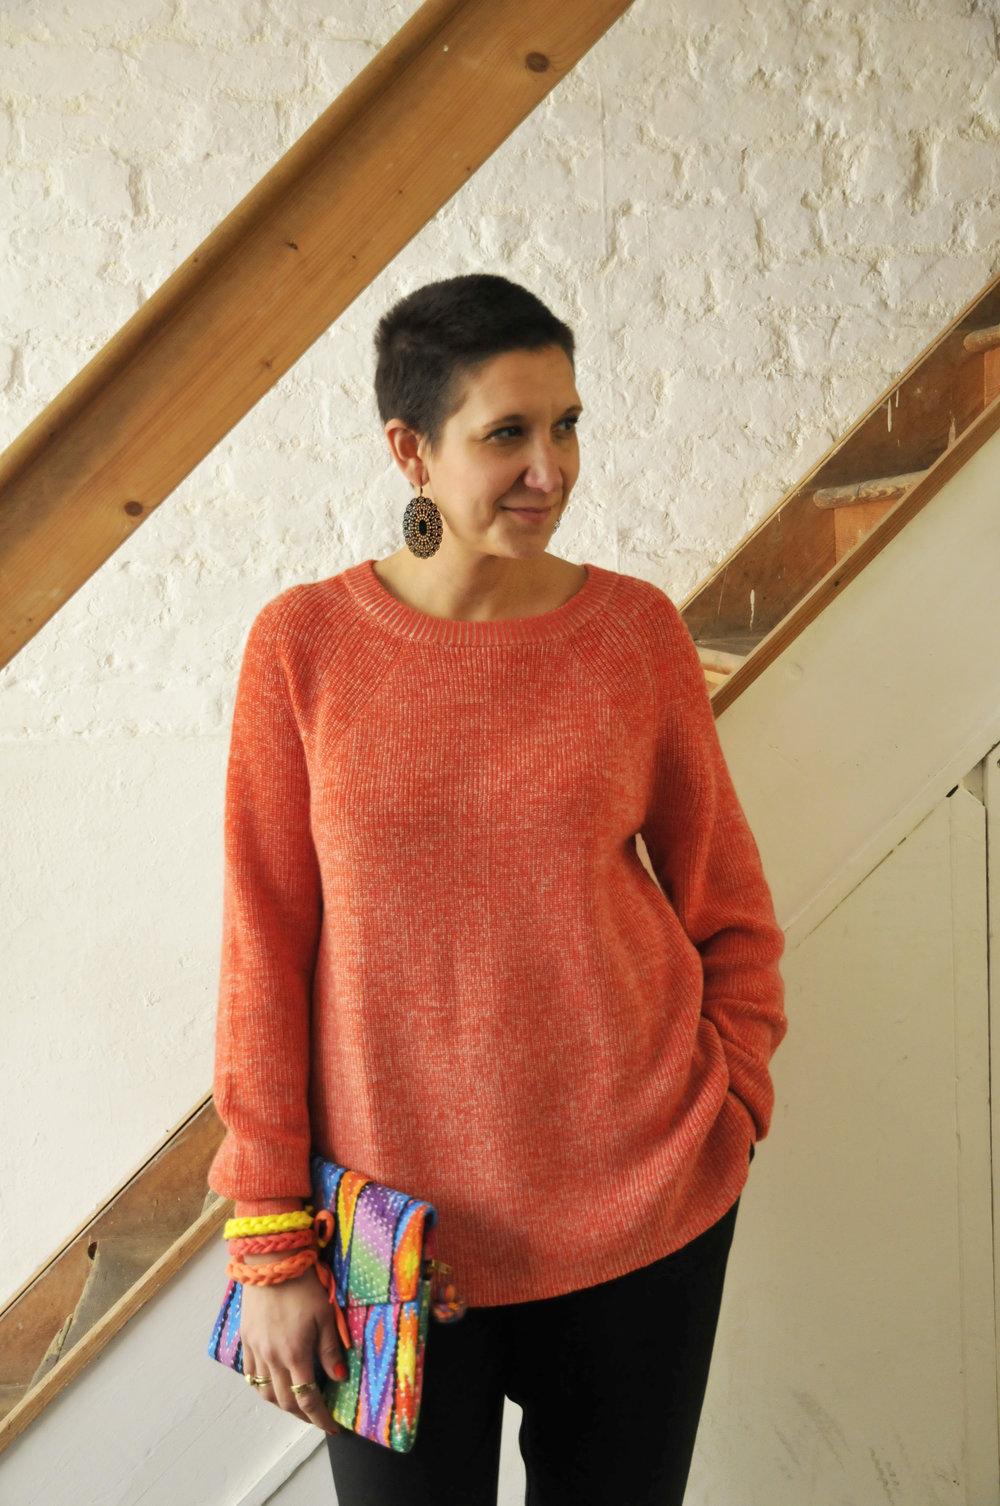 Knit Planet Jumper  Maske Trousers  Golly gumdrop Bracelets  Maya London Bag